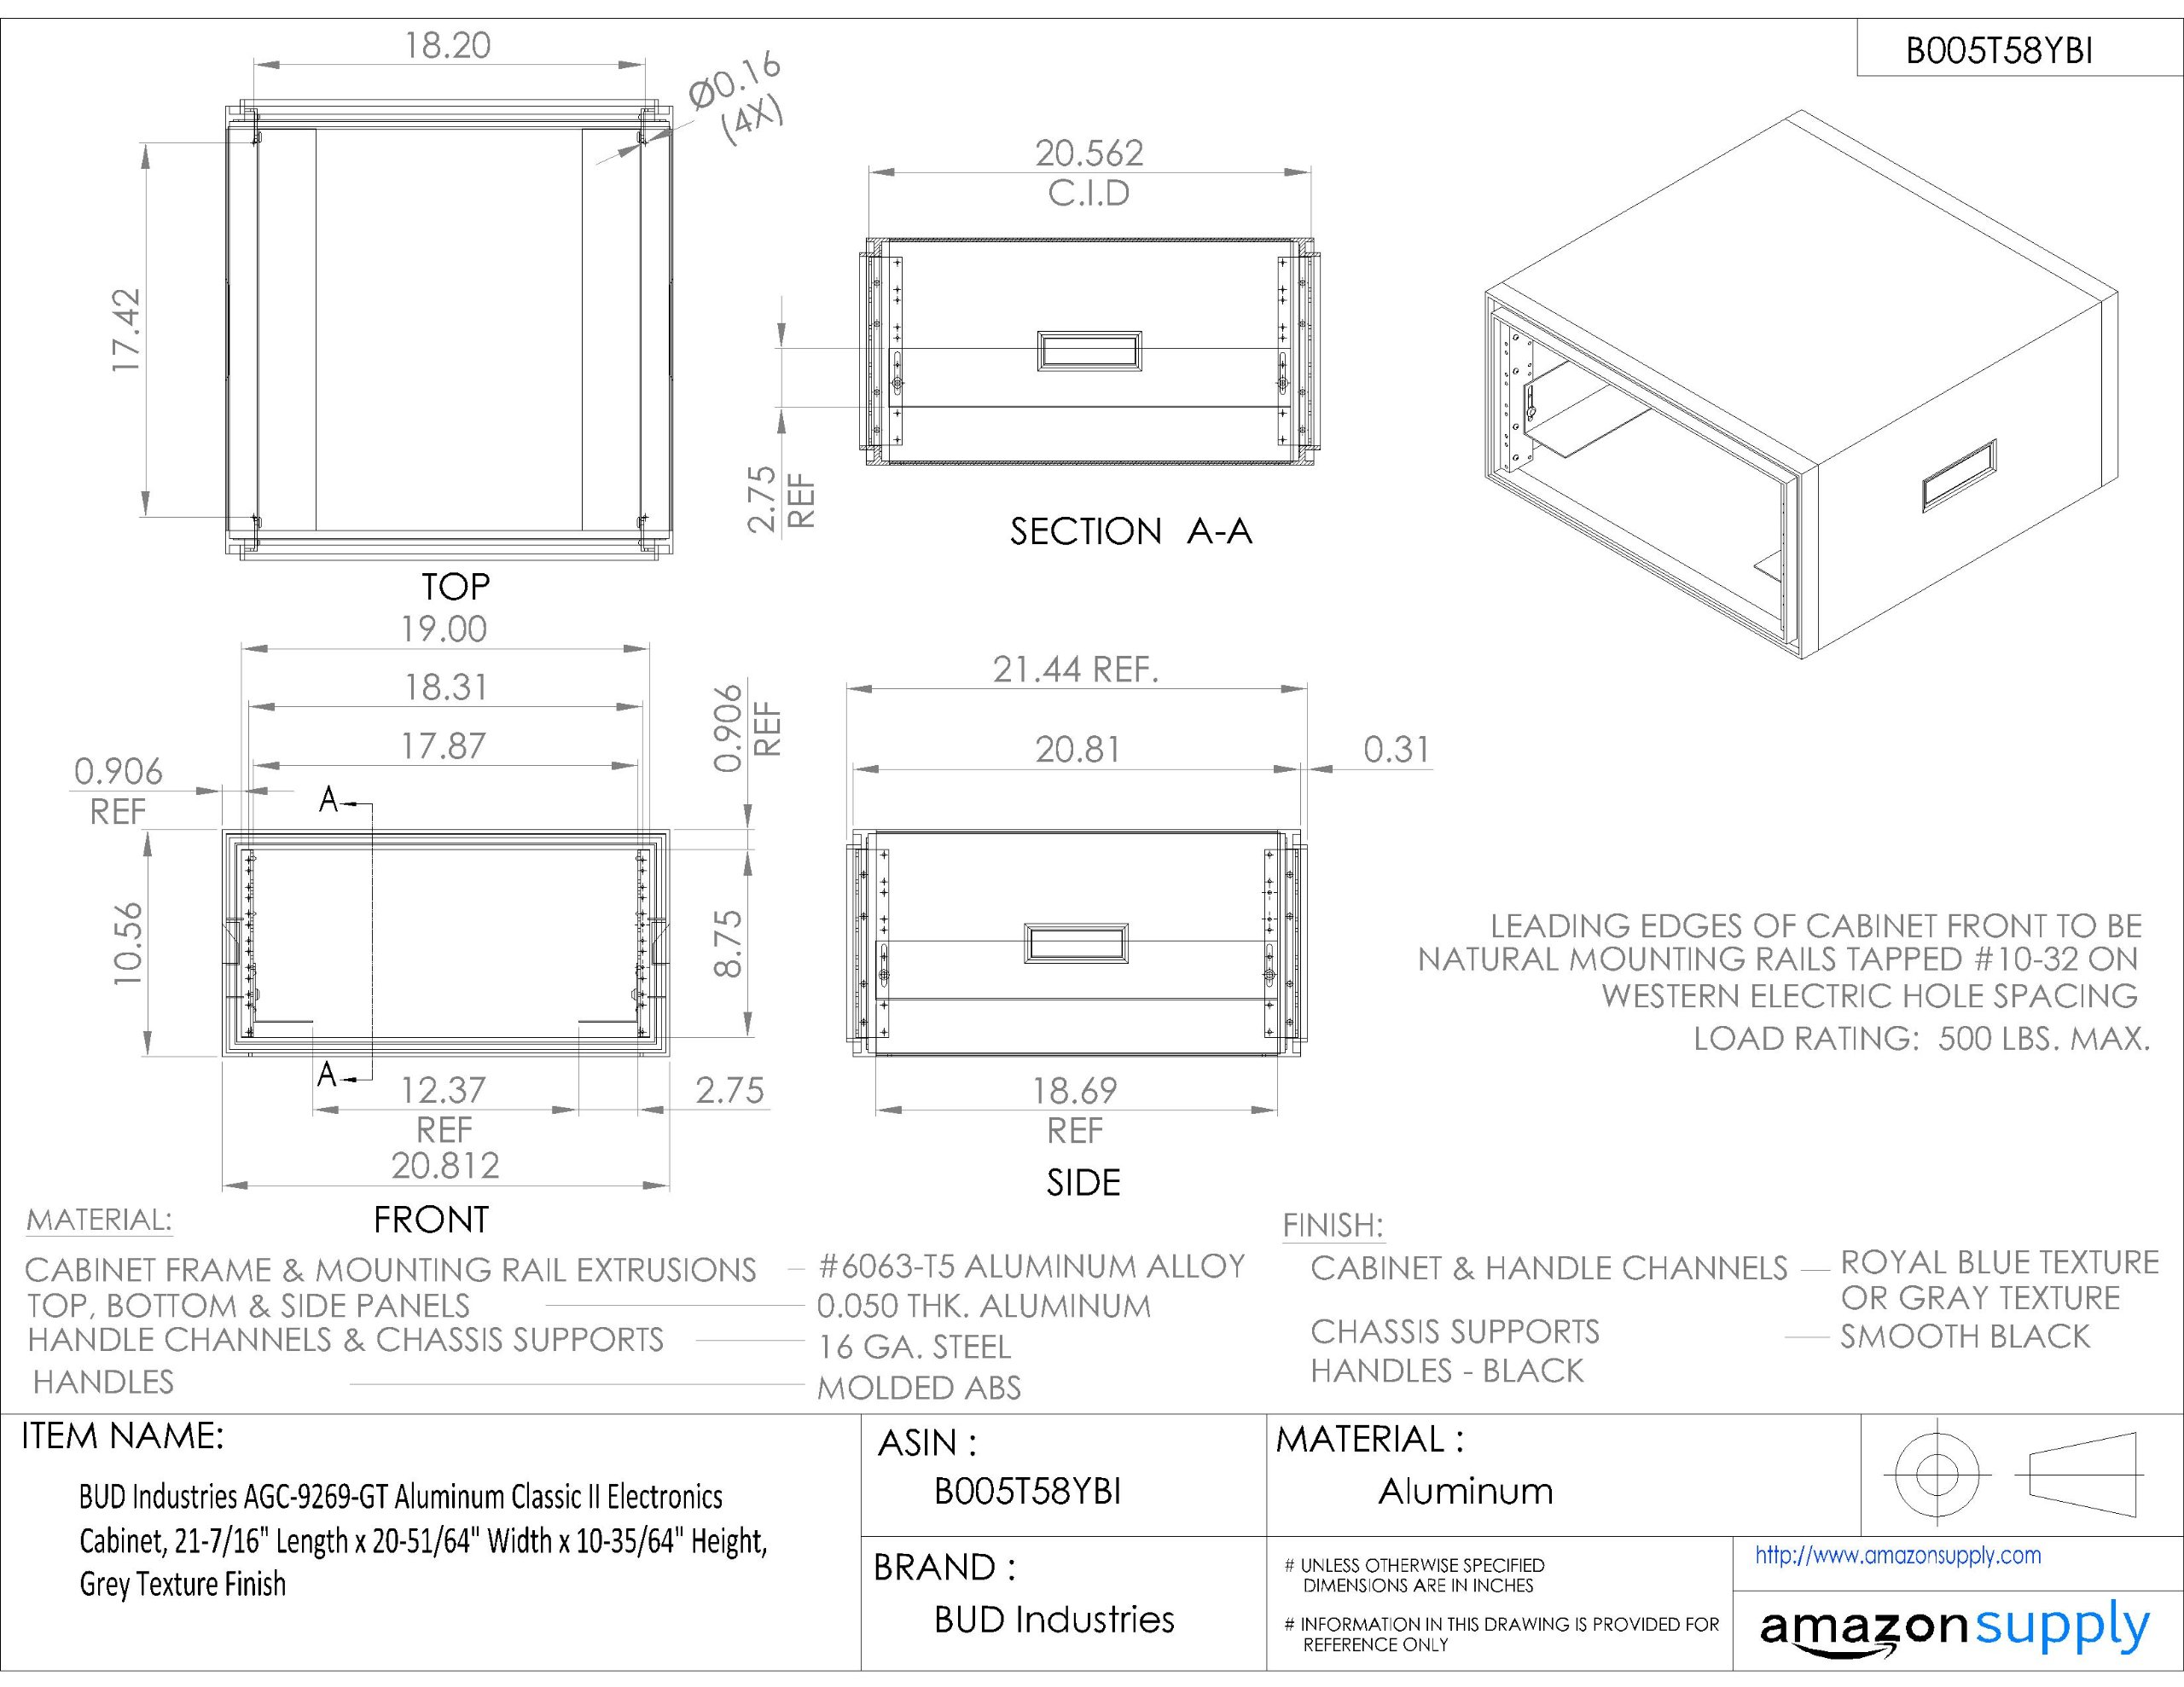 BUD Industries AGC-9269-GT Aluminum Classic II Electronics Cabinet, 21-7/16'' Length x 20-51/64'' Width x 10-35/64'' Height, Grey Texture Finish